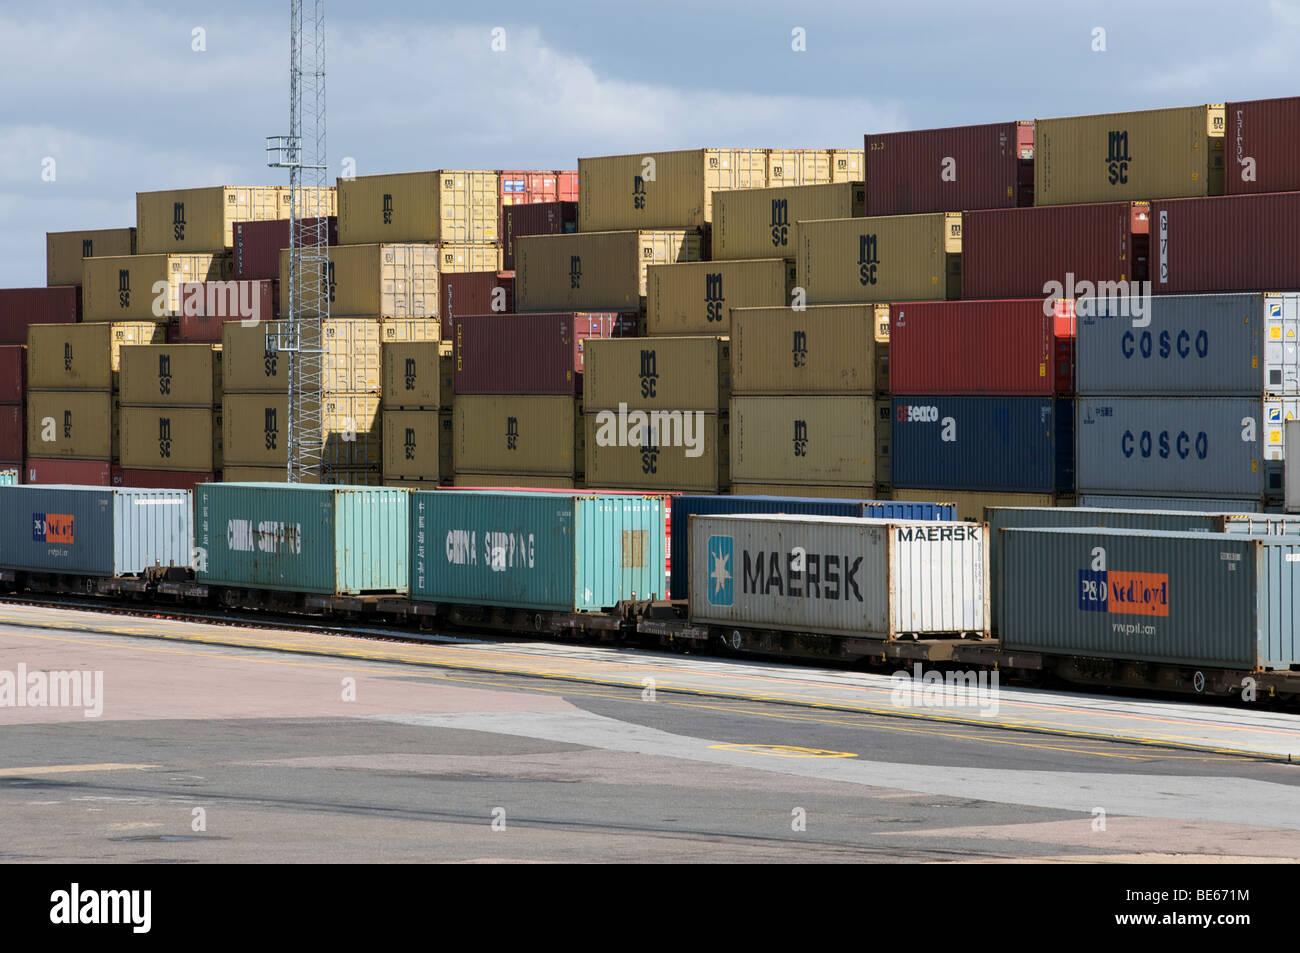 South Rail freight terminal, Port of Felixstowe, Suffolk, UK. Stock Photo